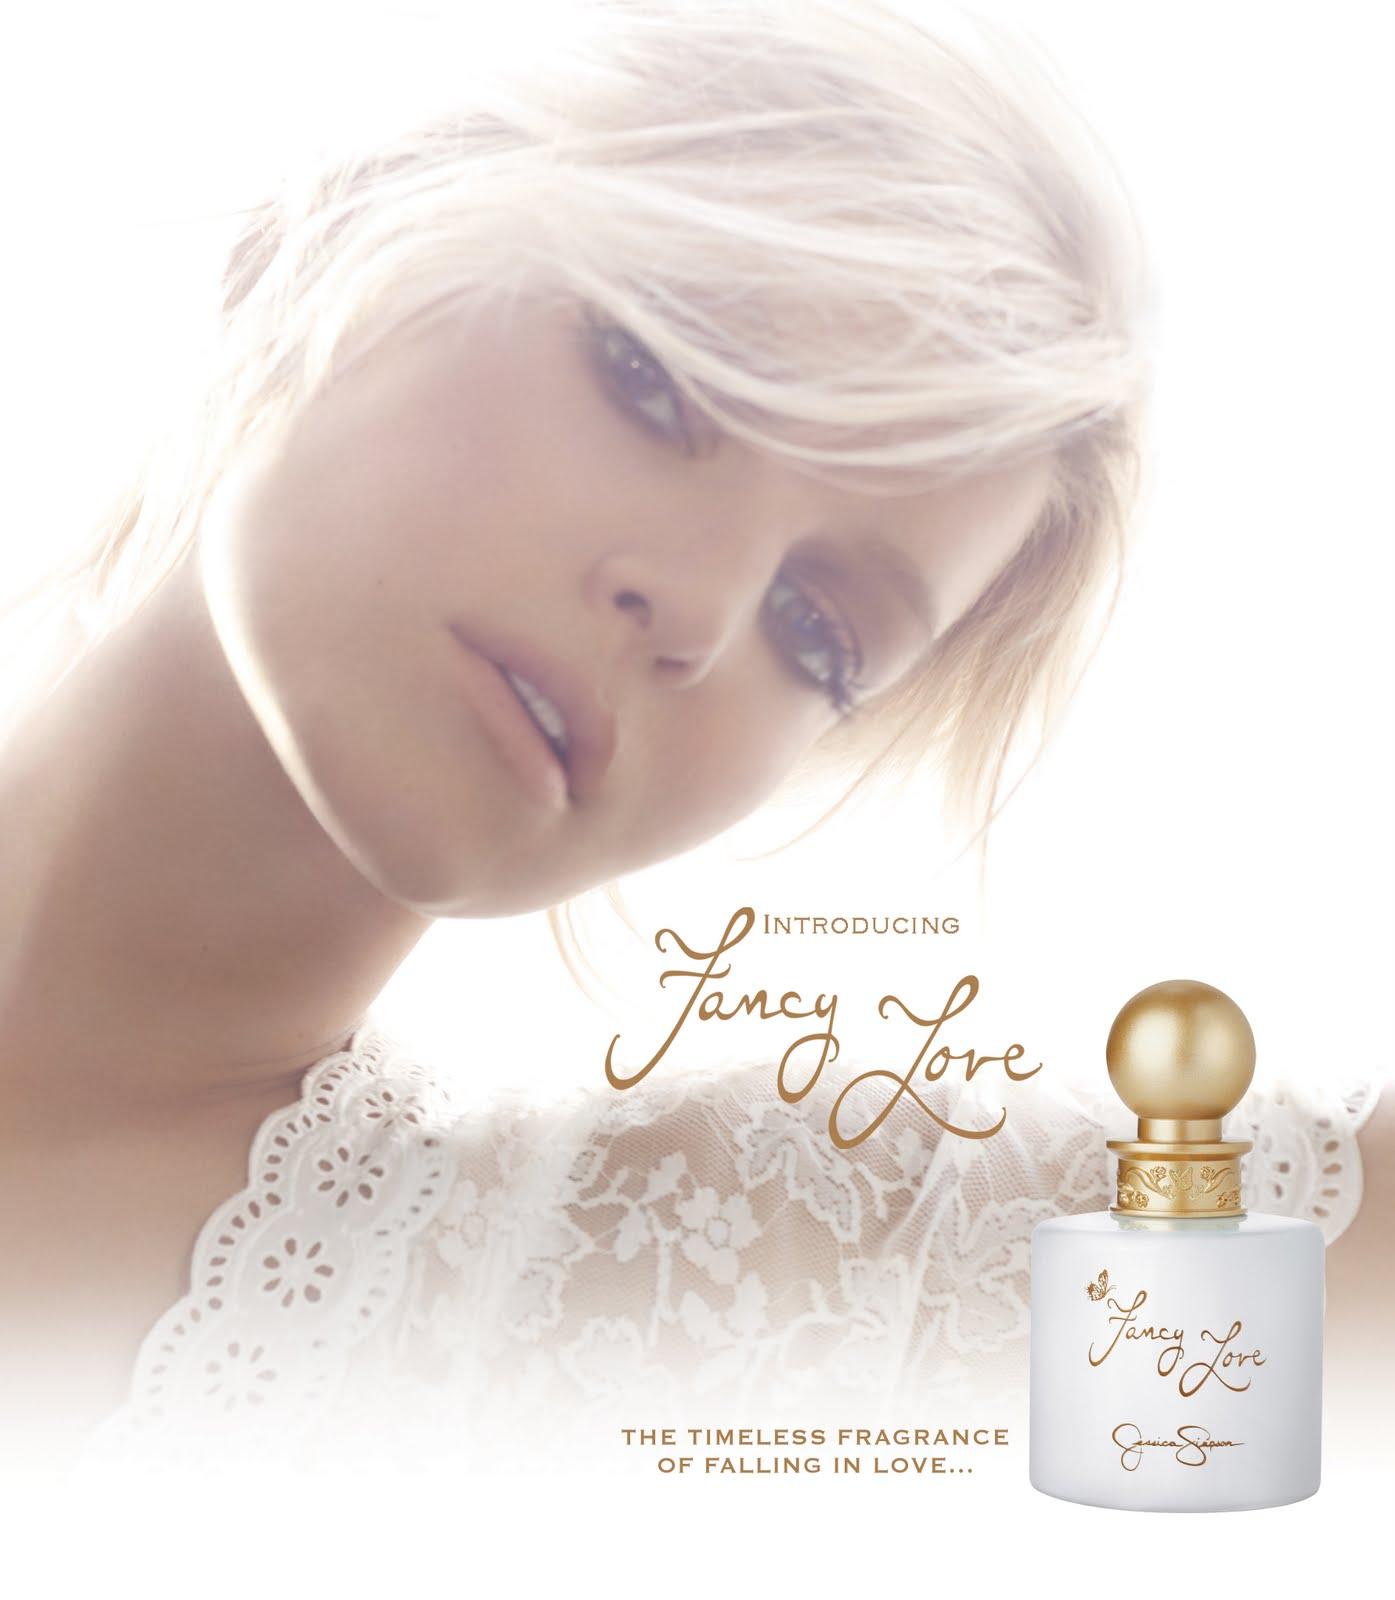 http://2.bp.blogspot.com/-5RiWwfXisc0/UE3-4eIQCRI/AAAAAAAAB60/FseCf8gC7kY/s1600/Jessica+Simpson+Fancy+Love+Perfume+.jpg